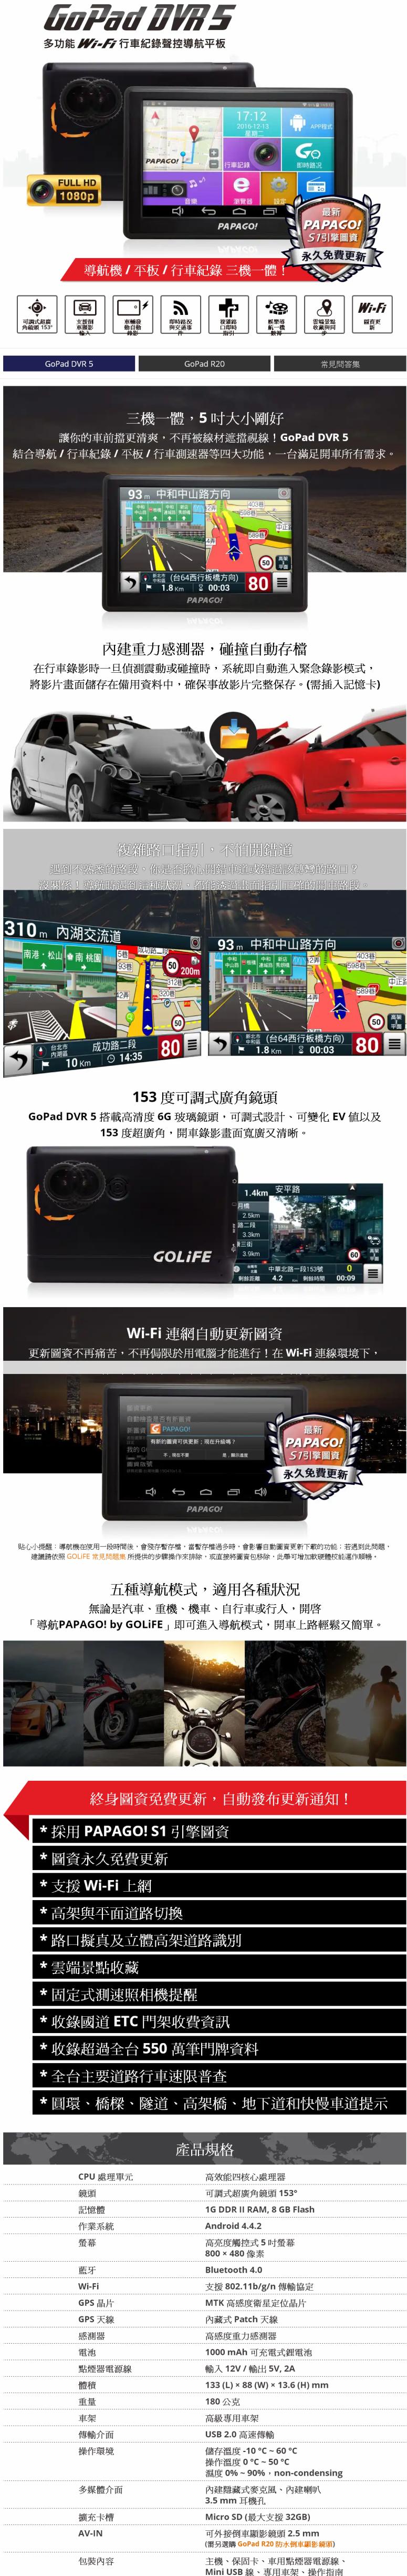 GOLiFE GoPad DVR 5 Wi-Fi 行車紀錄聲控導航平板 - GOLiFE